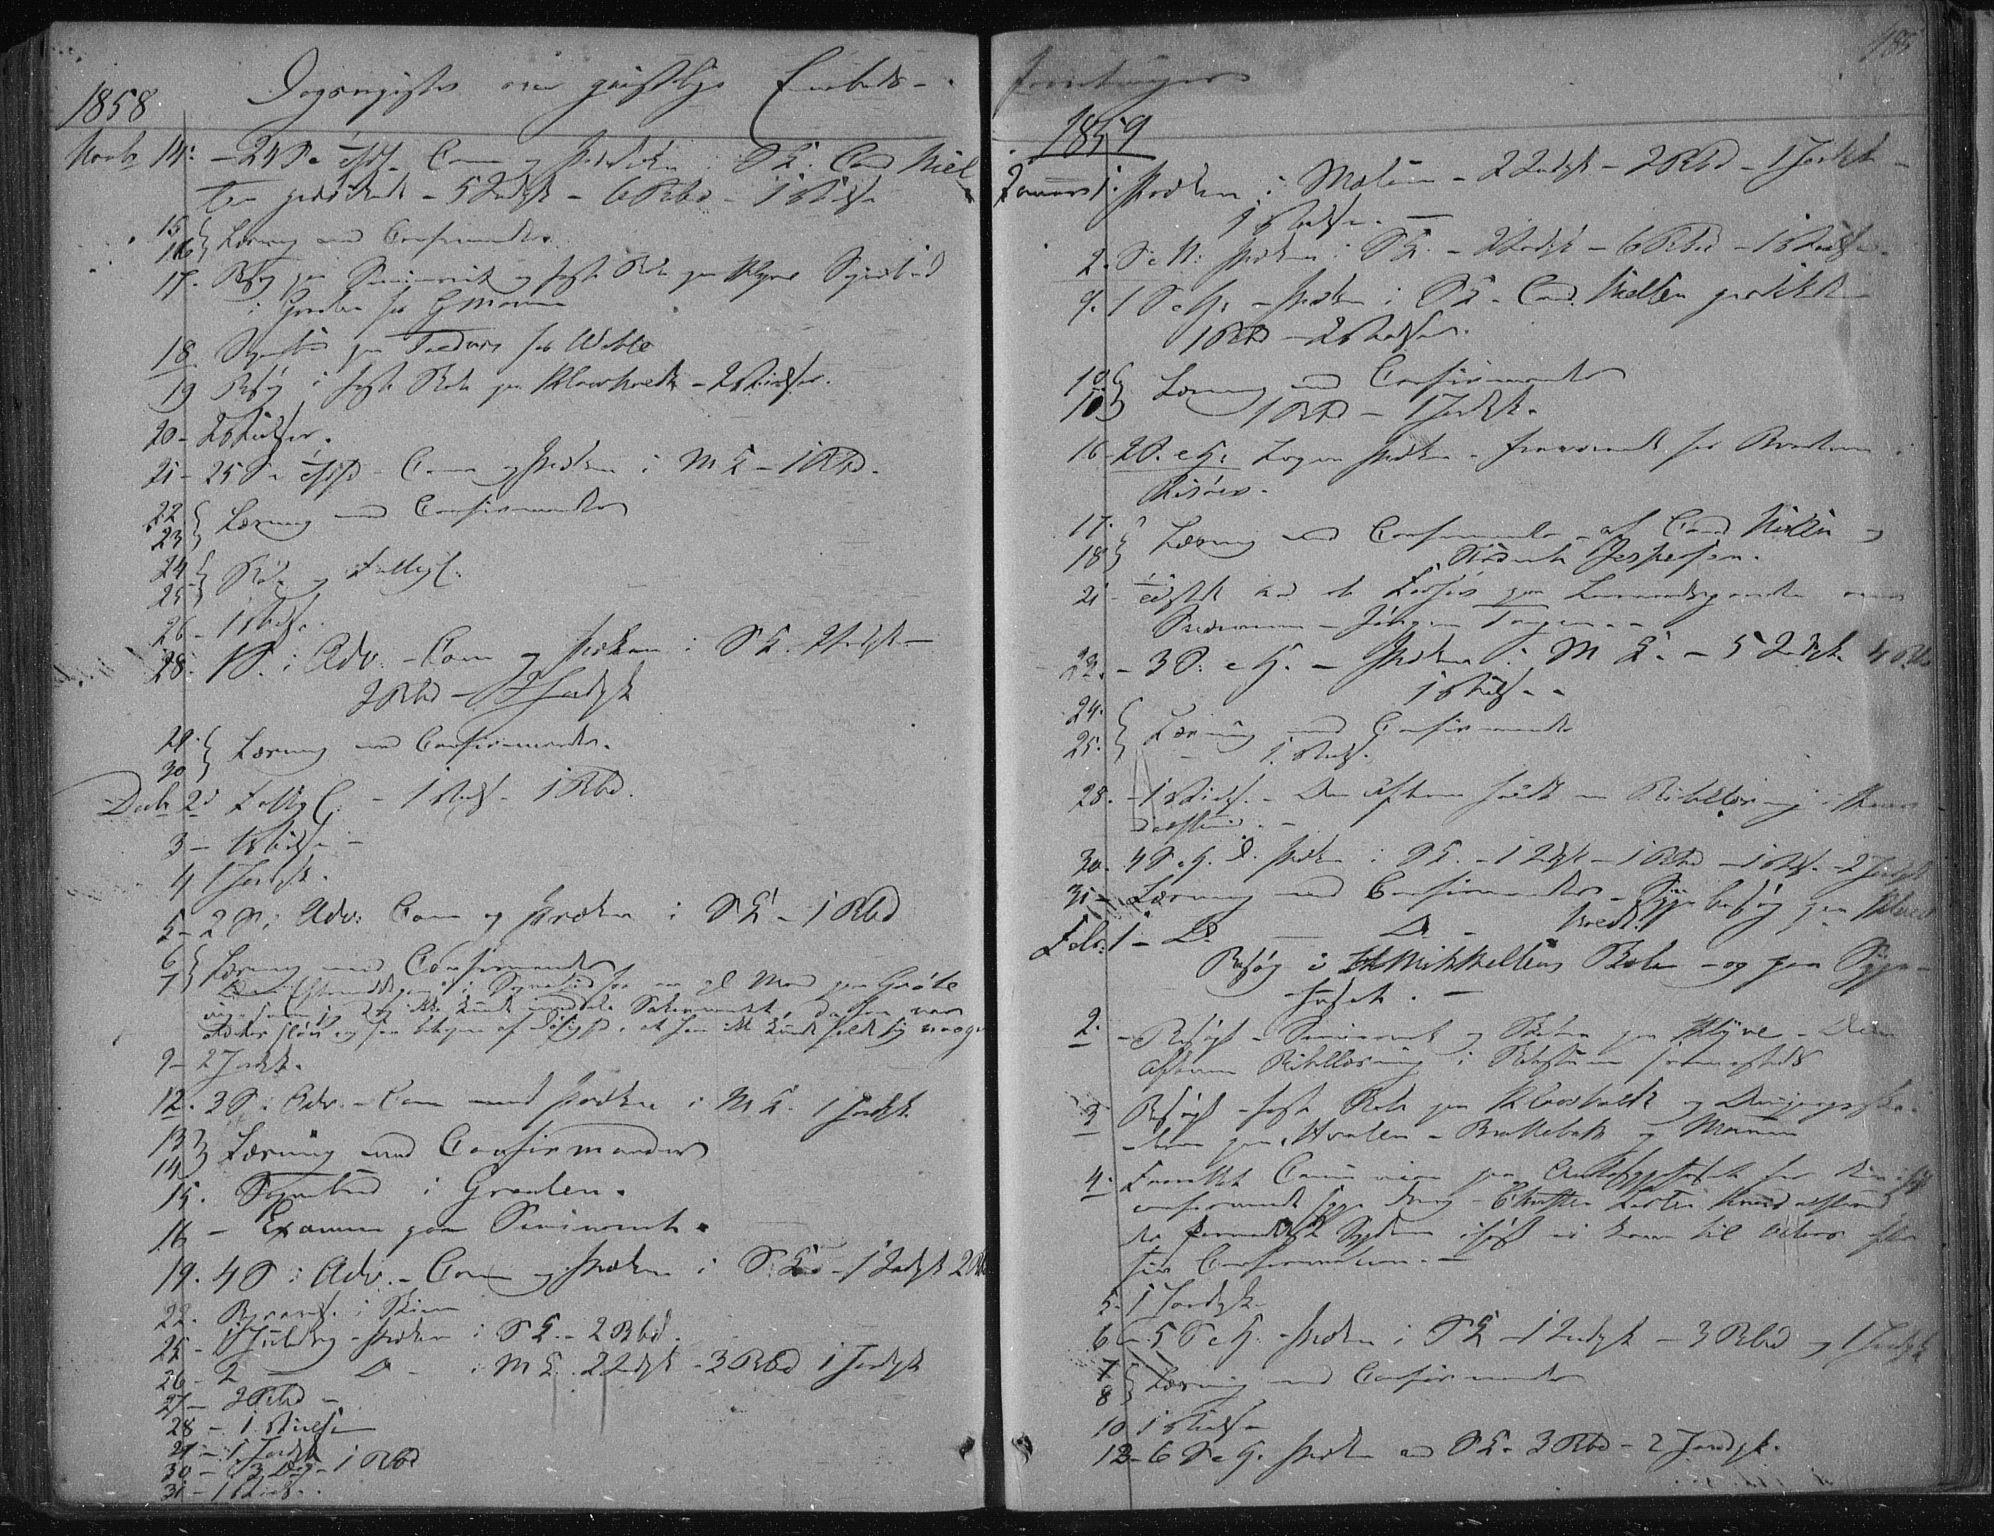 SAKO, Solum kirkebøker, F/Fa/L0007: Ministerialbok nr. I 7, 1856-1864, s. 485